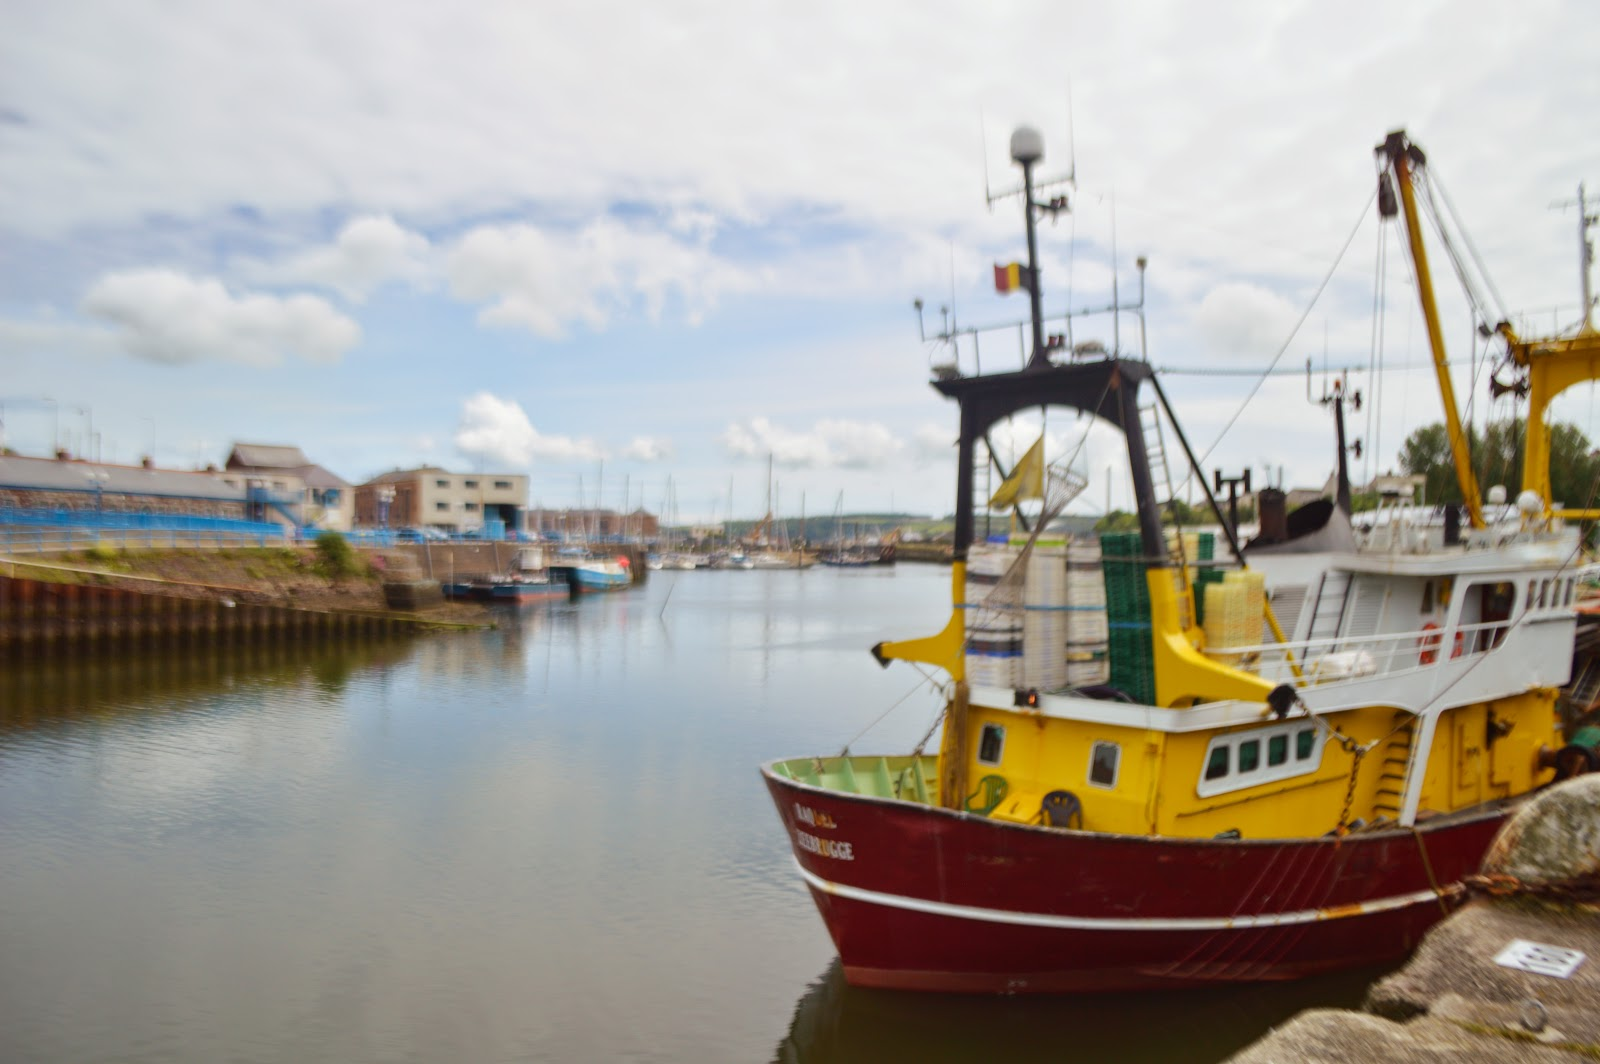 Milford Marina Pembrokeshire